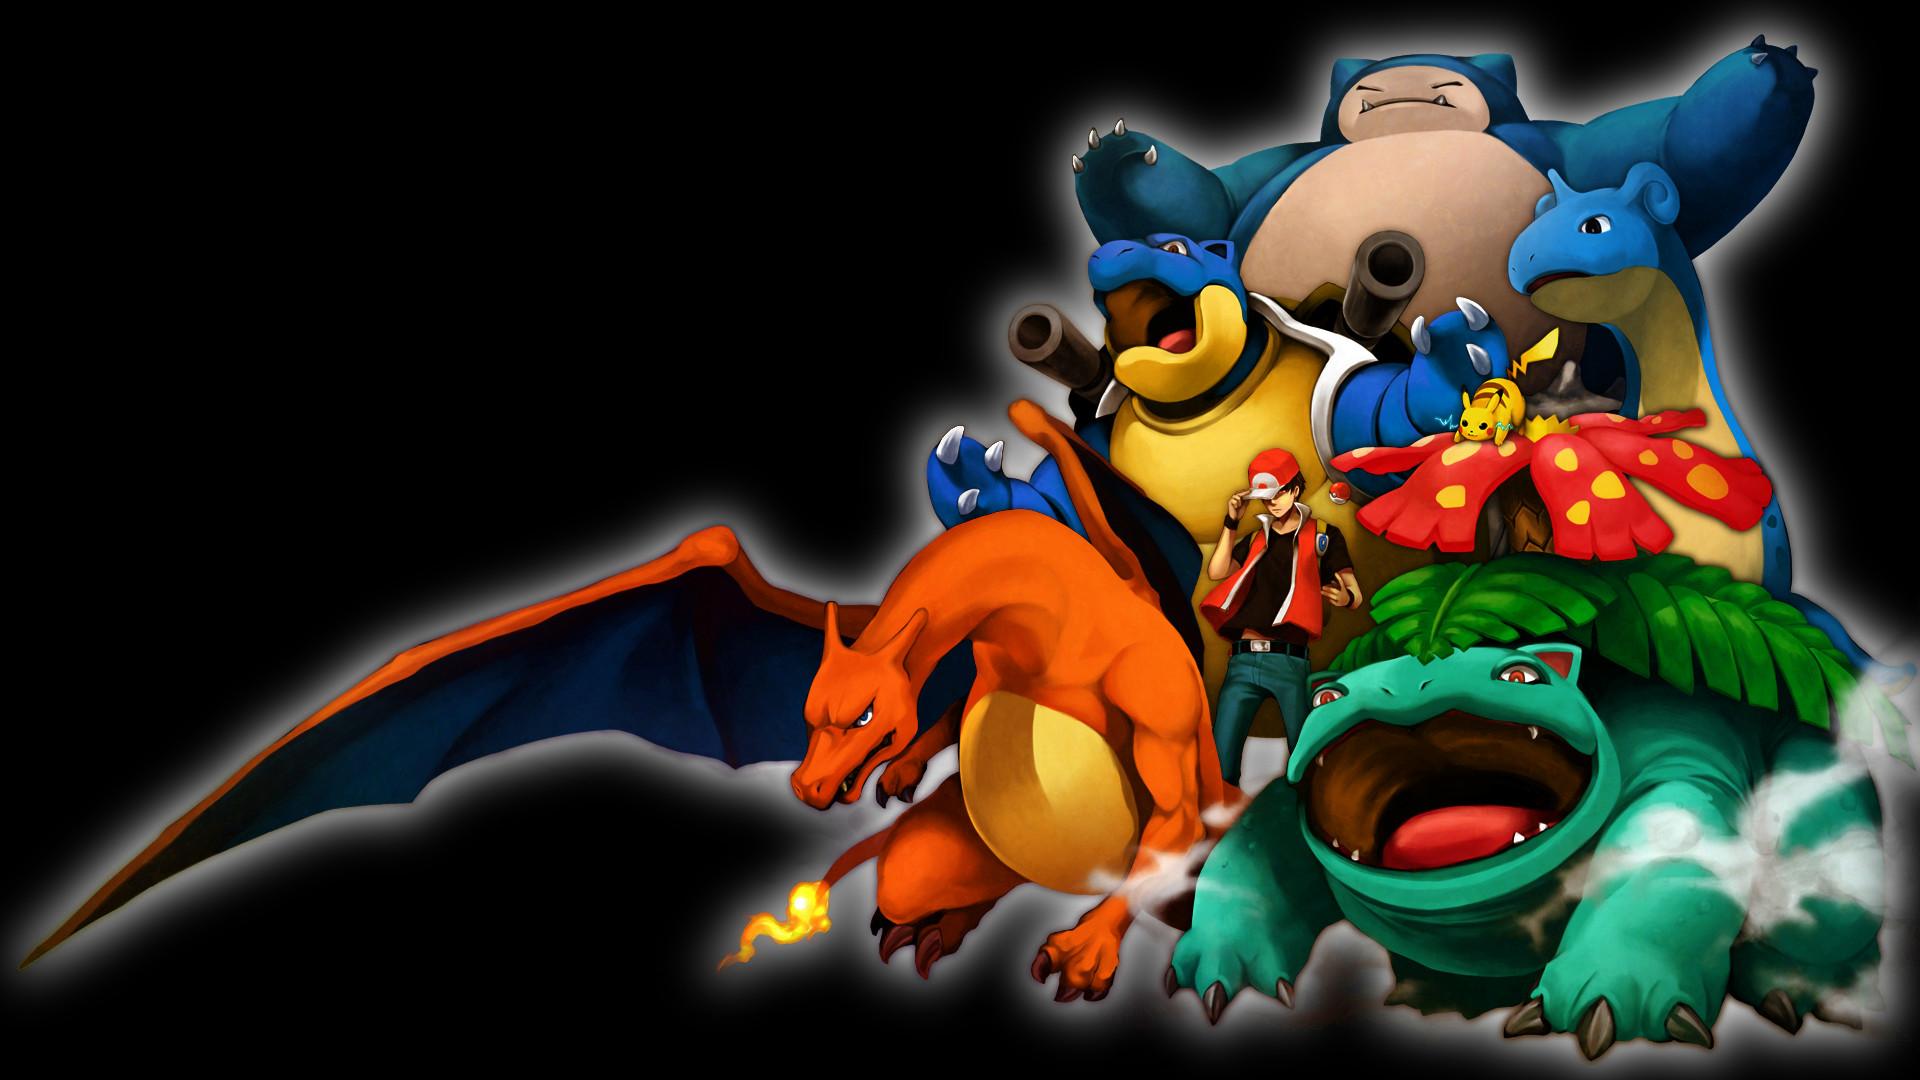 Pokemon Wallpaper – Free Large Images. Original Resolution